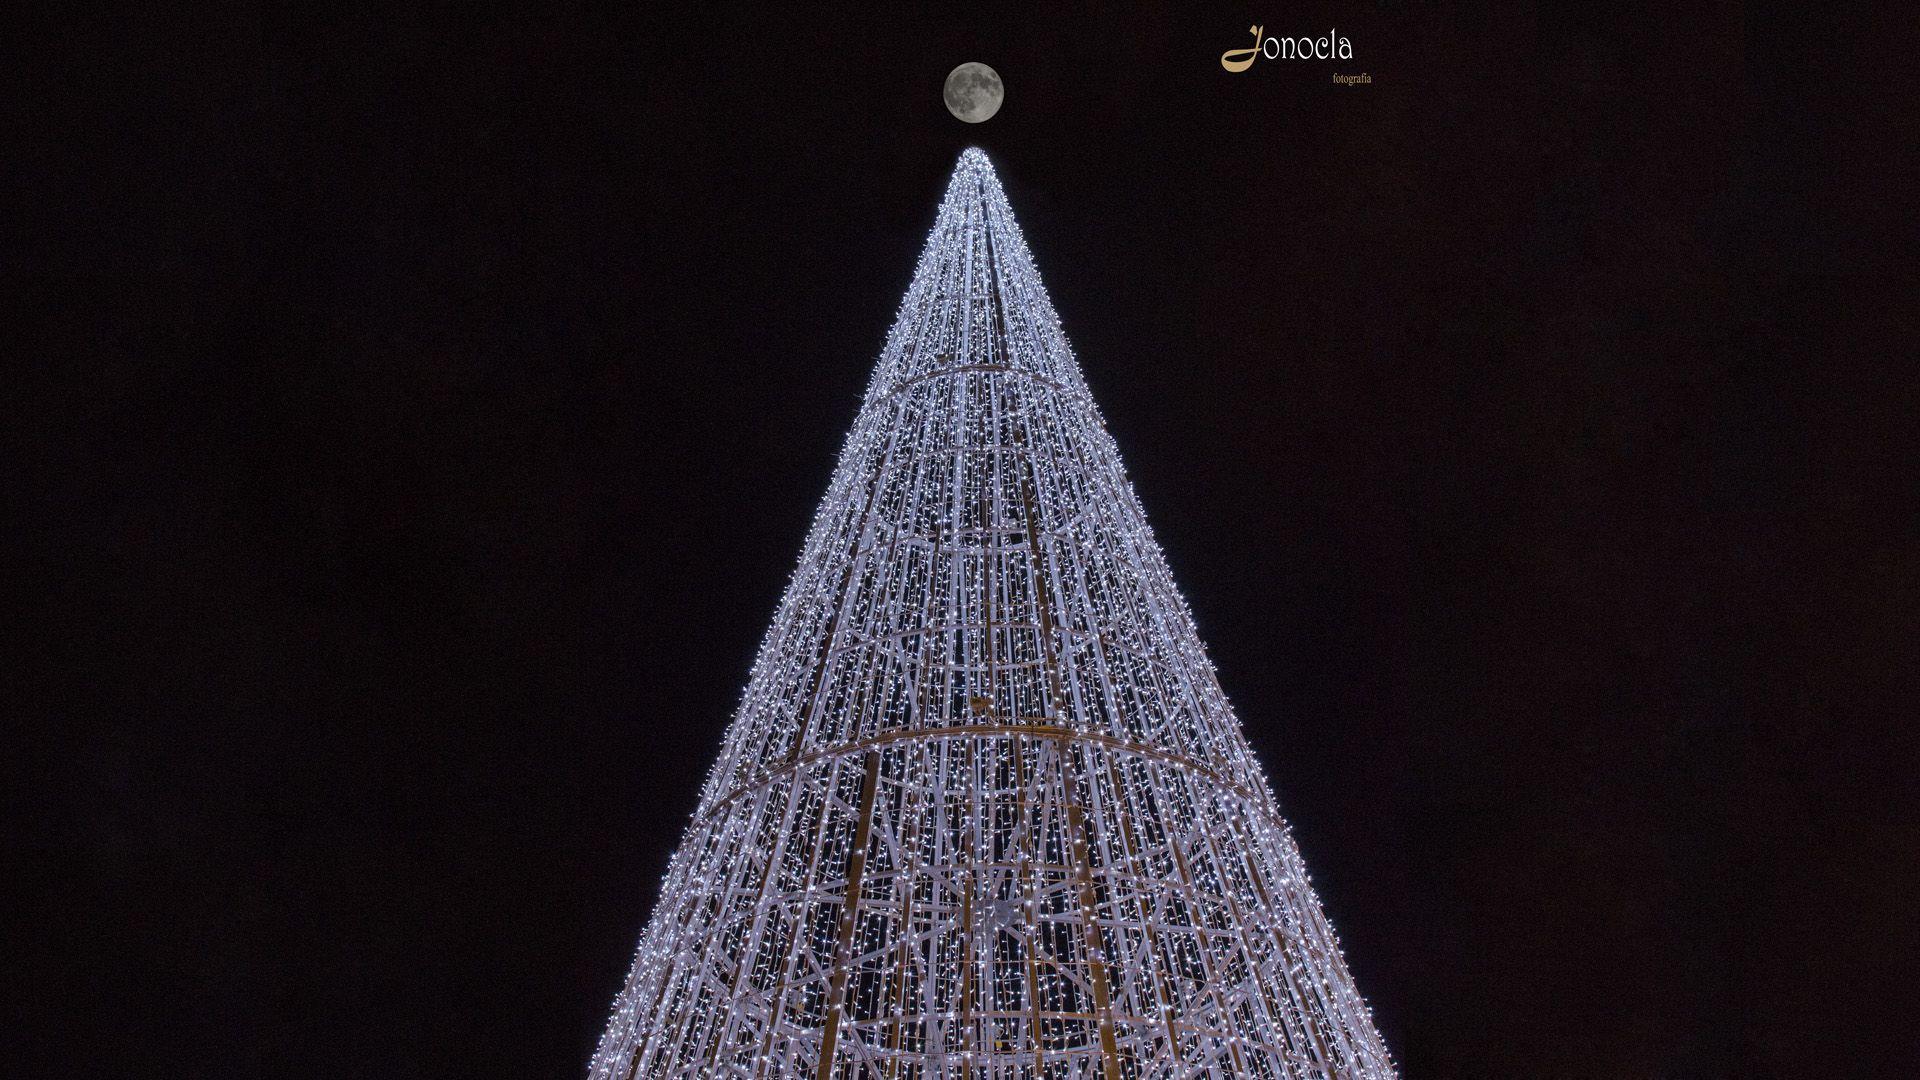 luna en Jerez